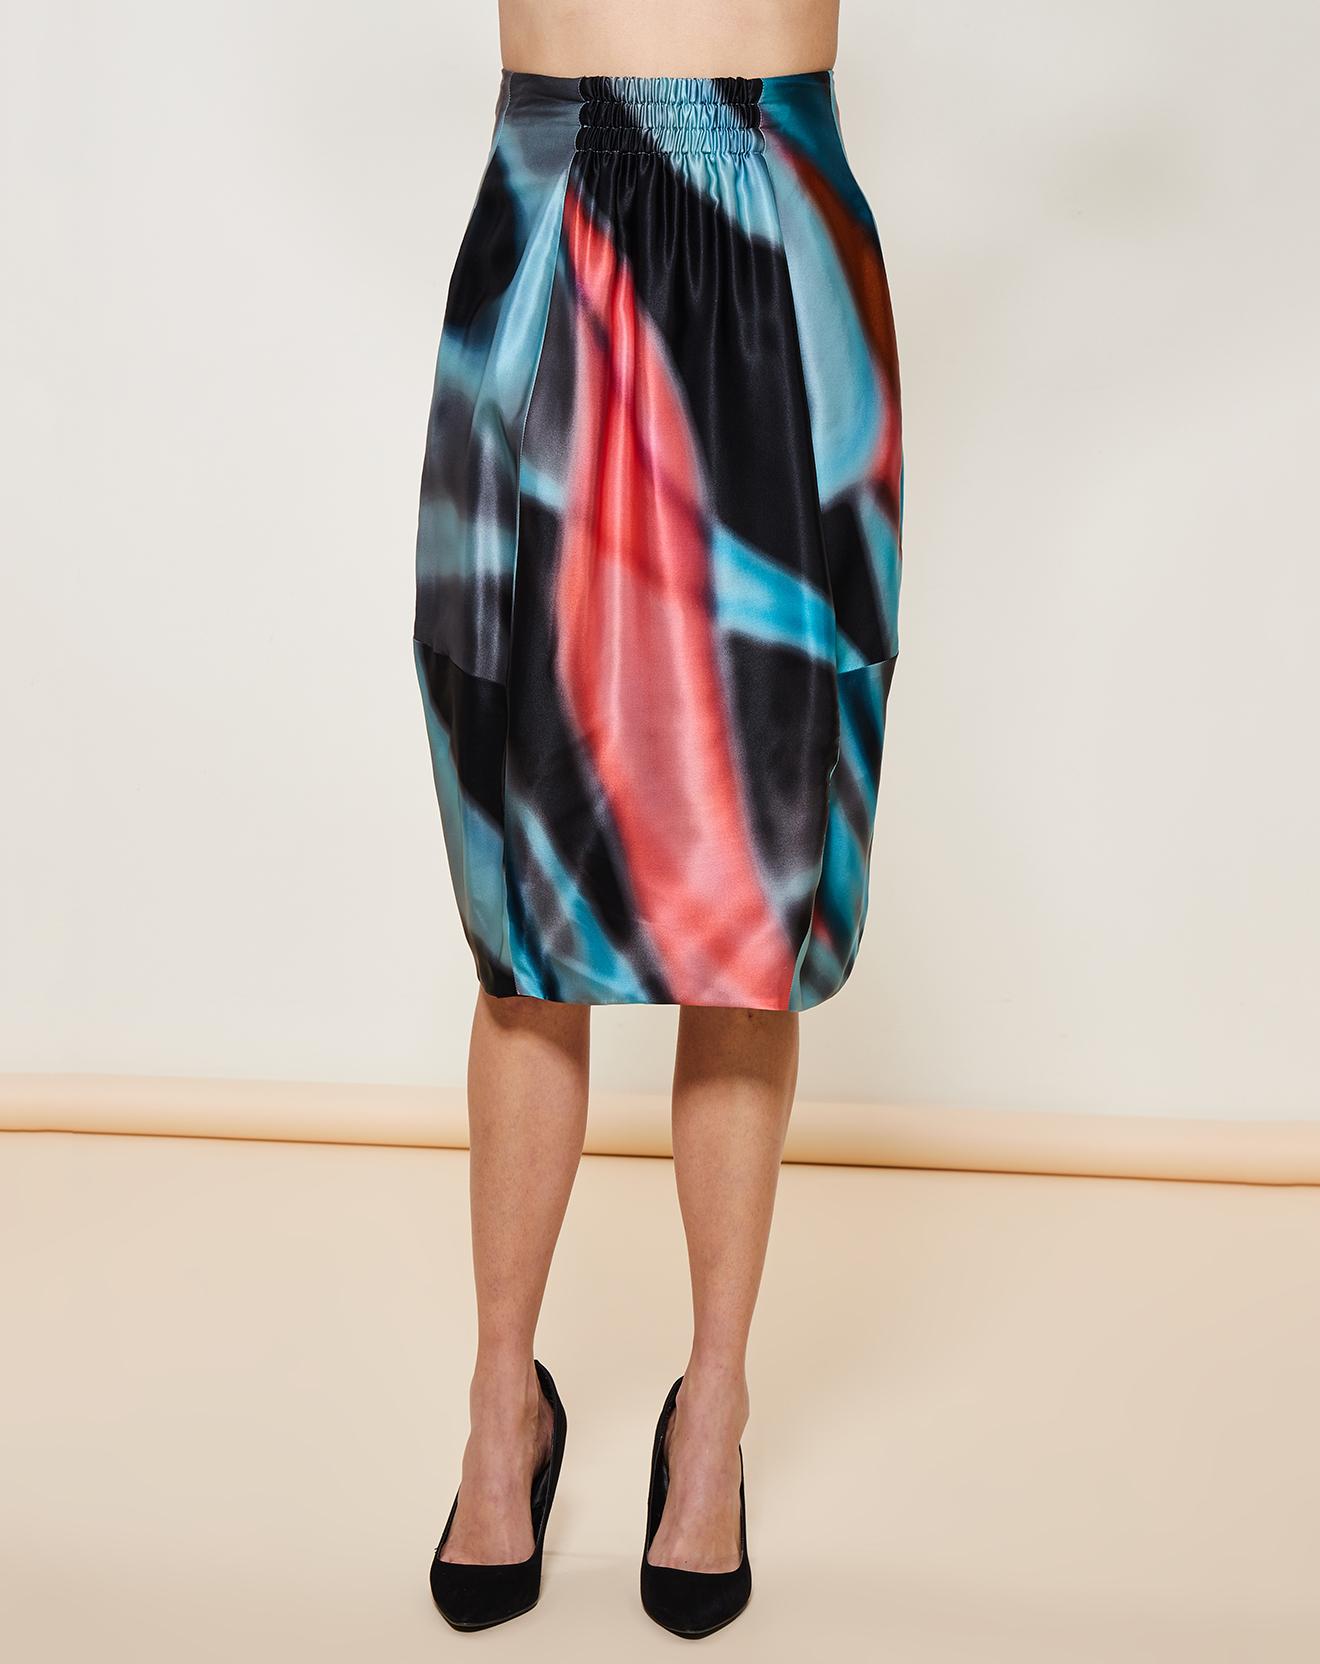 Jupe mi-longue 100% soie imprimée abstrait multicolore - Giorgio Armani - Modalova